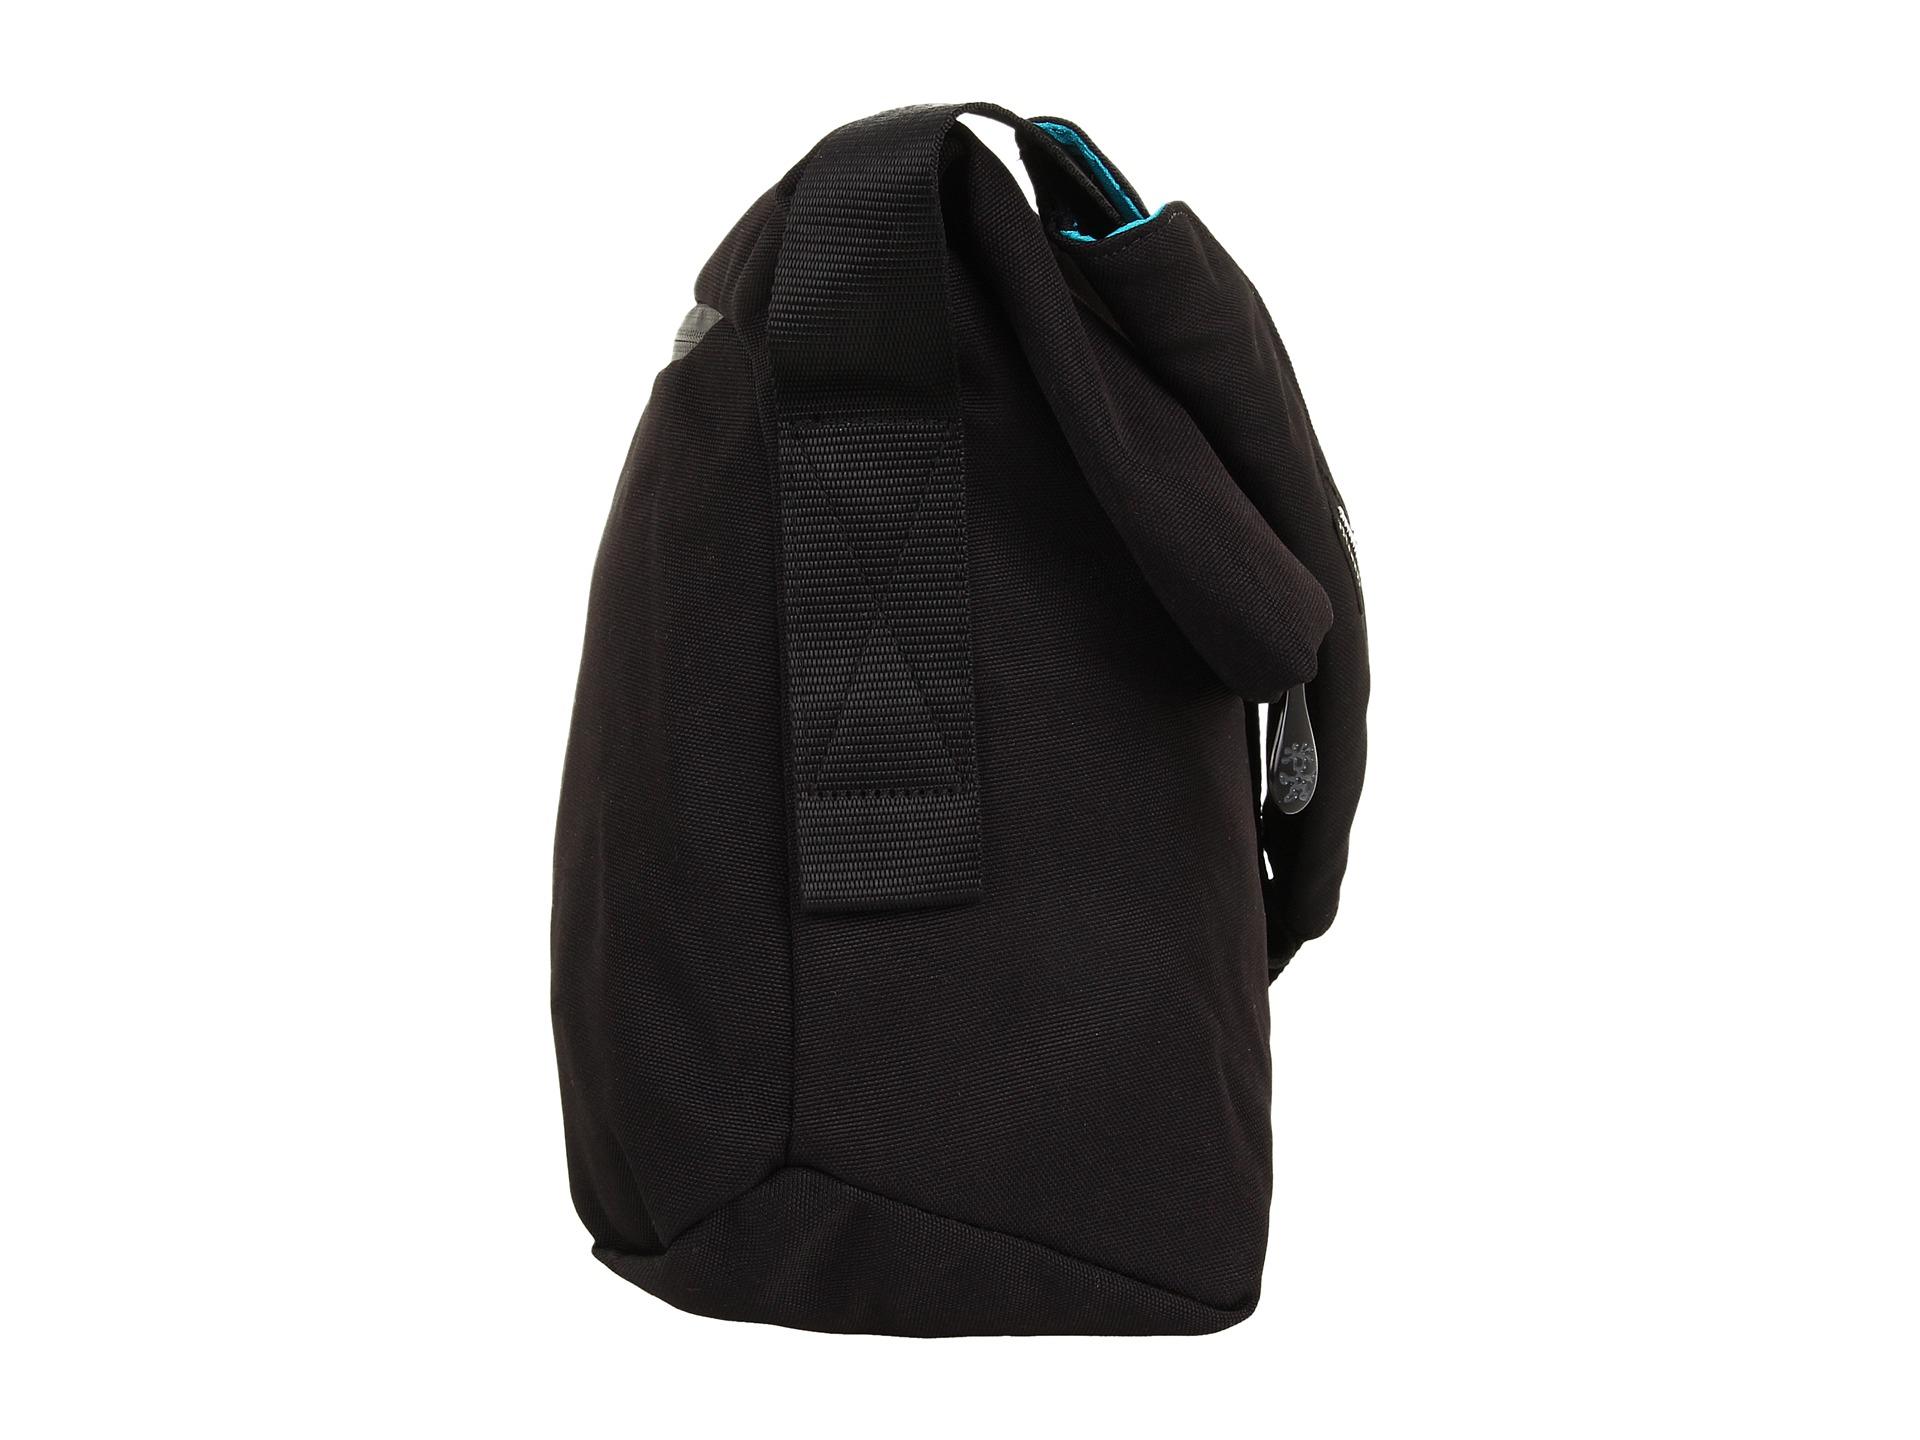 c7a3aa1b88 Crumpler The Pinnacle Of Horror Commuter Laptop Shoulder Bag in ...